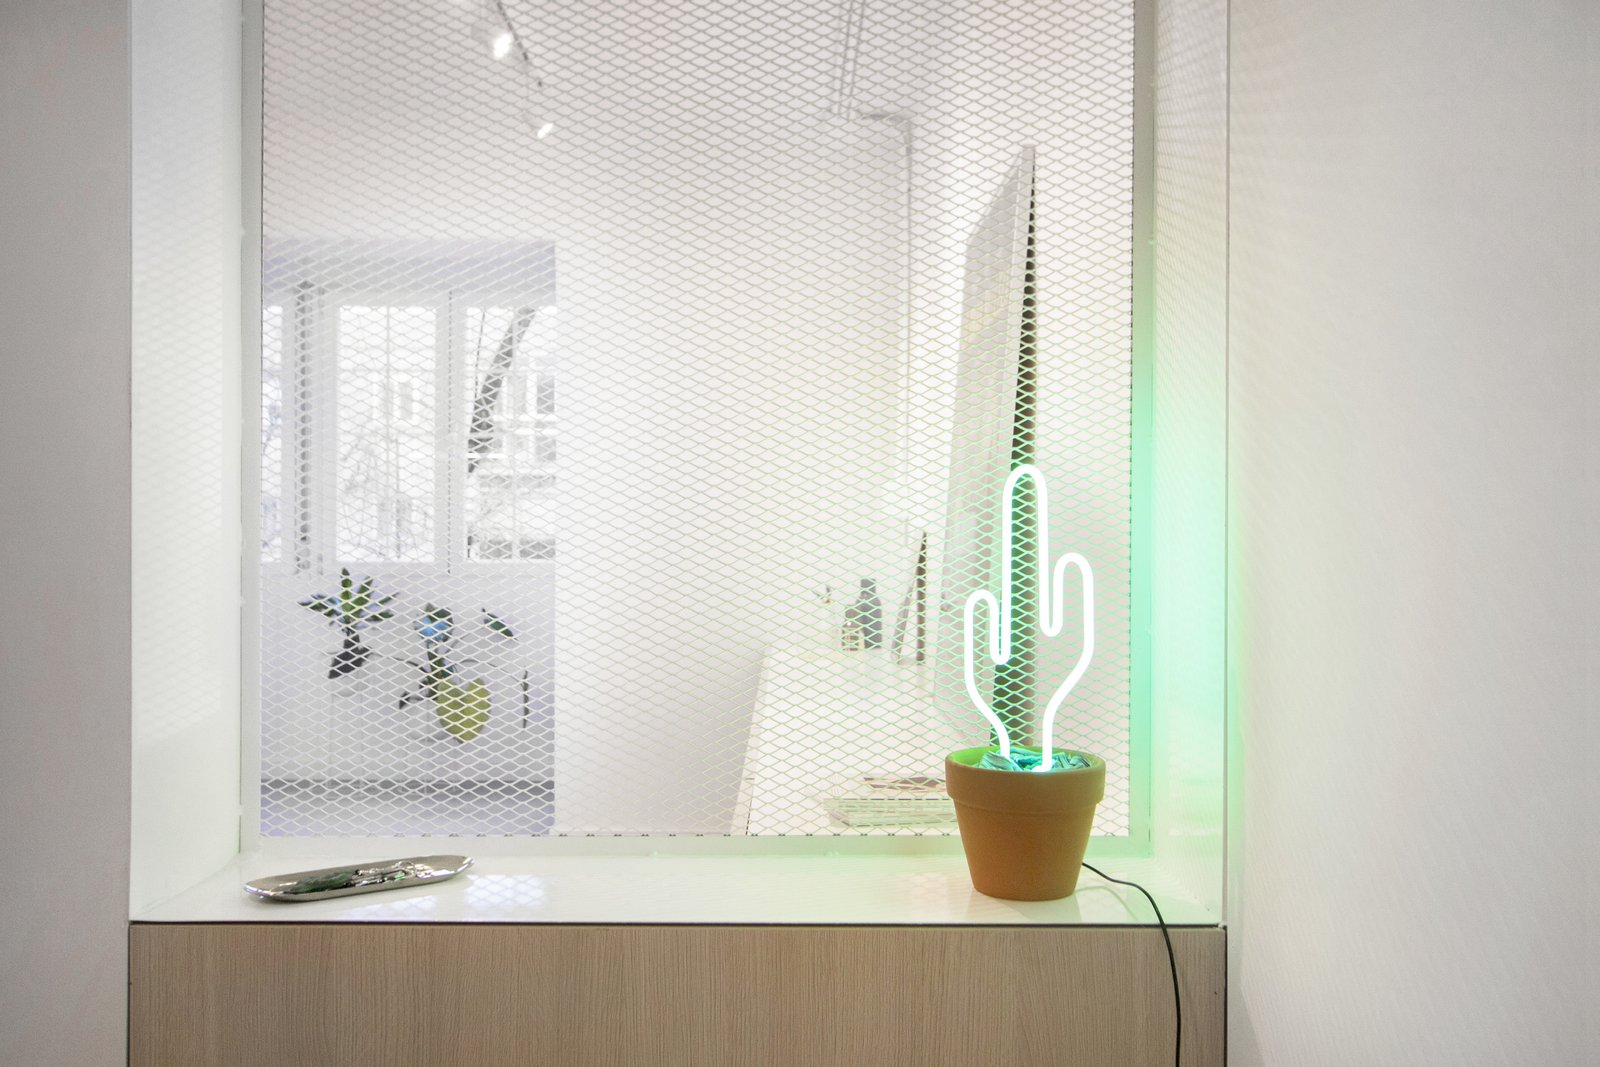 Living Room, Table Lighting, Lamps, Media Cabinet, Storage, and Concrete Floor 014.CASA PEX  014.PEX 114 - Apartment Renovation by estudio AMÁSL